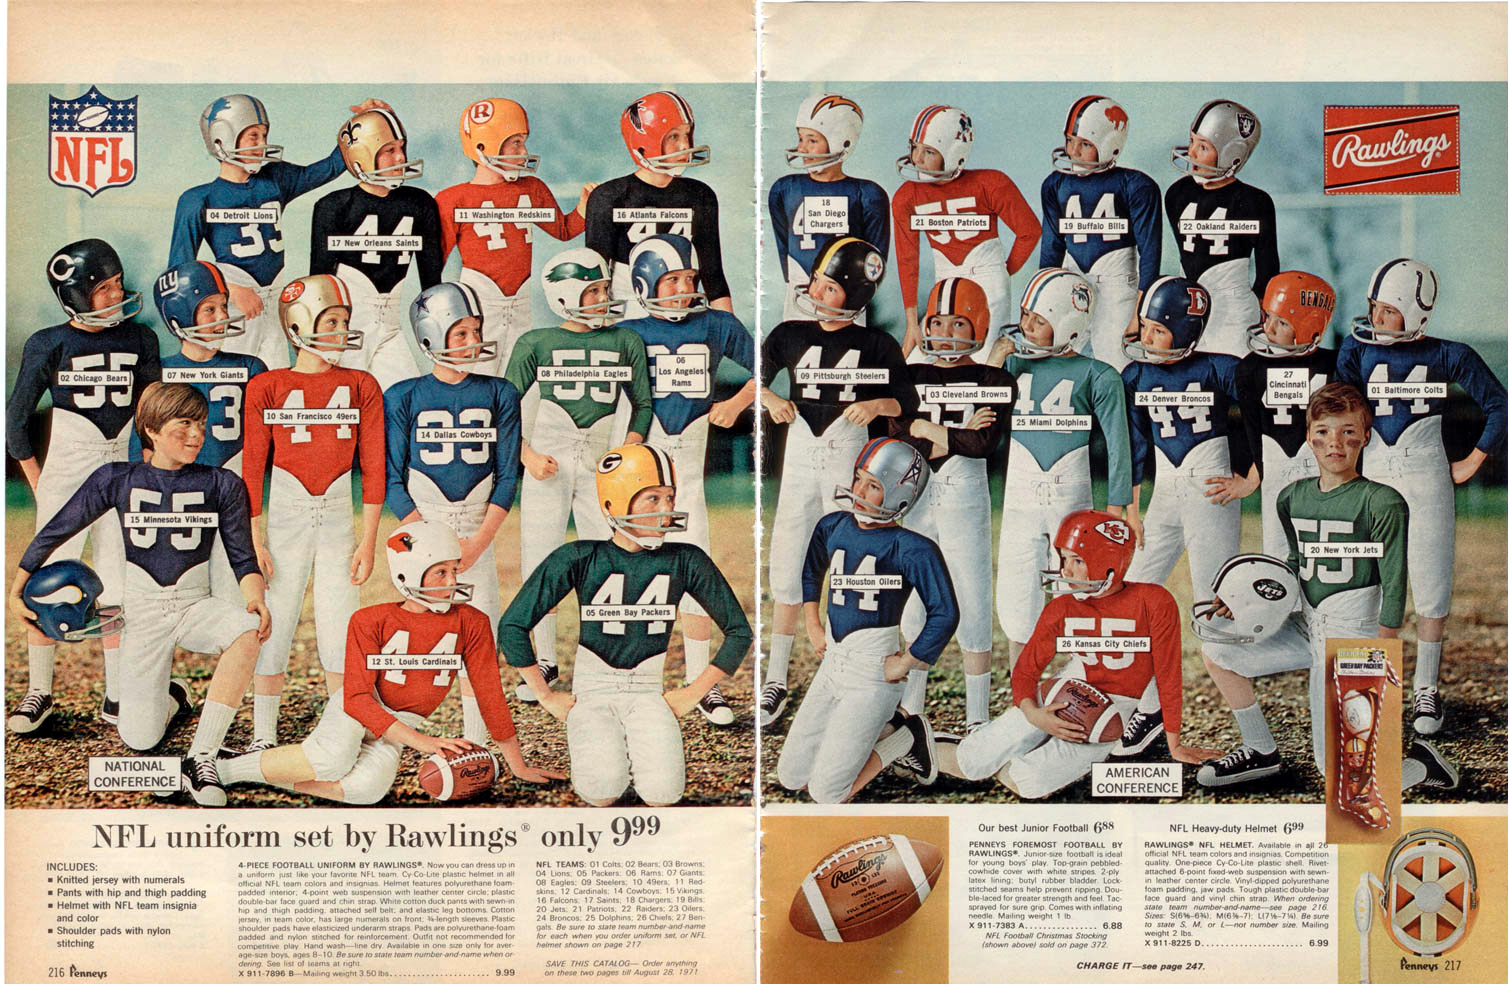 c7bb19aea My original los angeles rams football uniform kit was very similar to these  dating back jpg